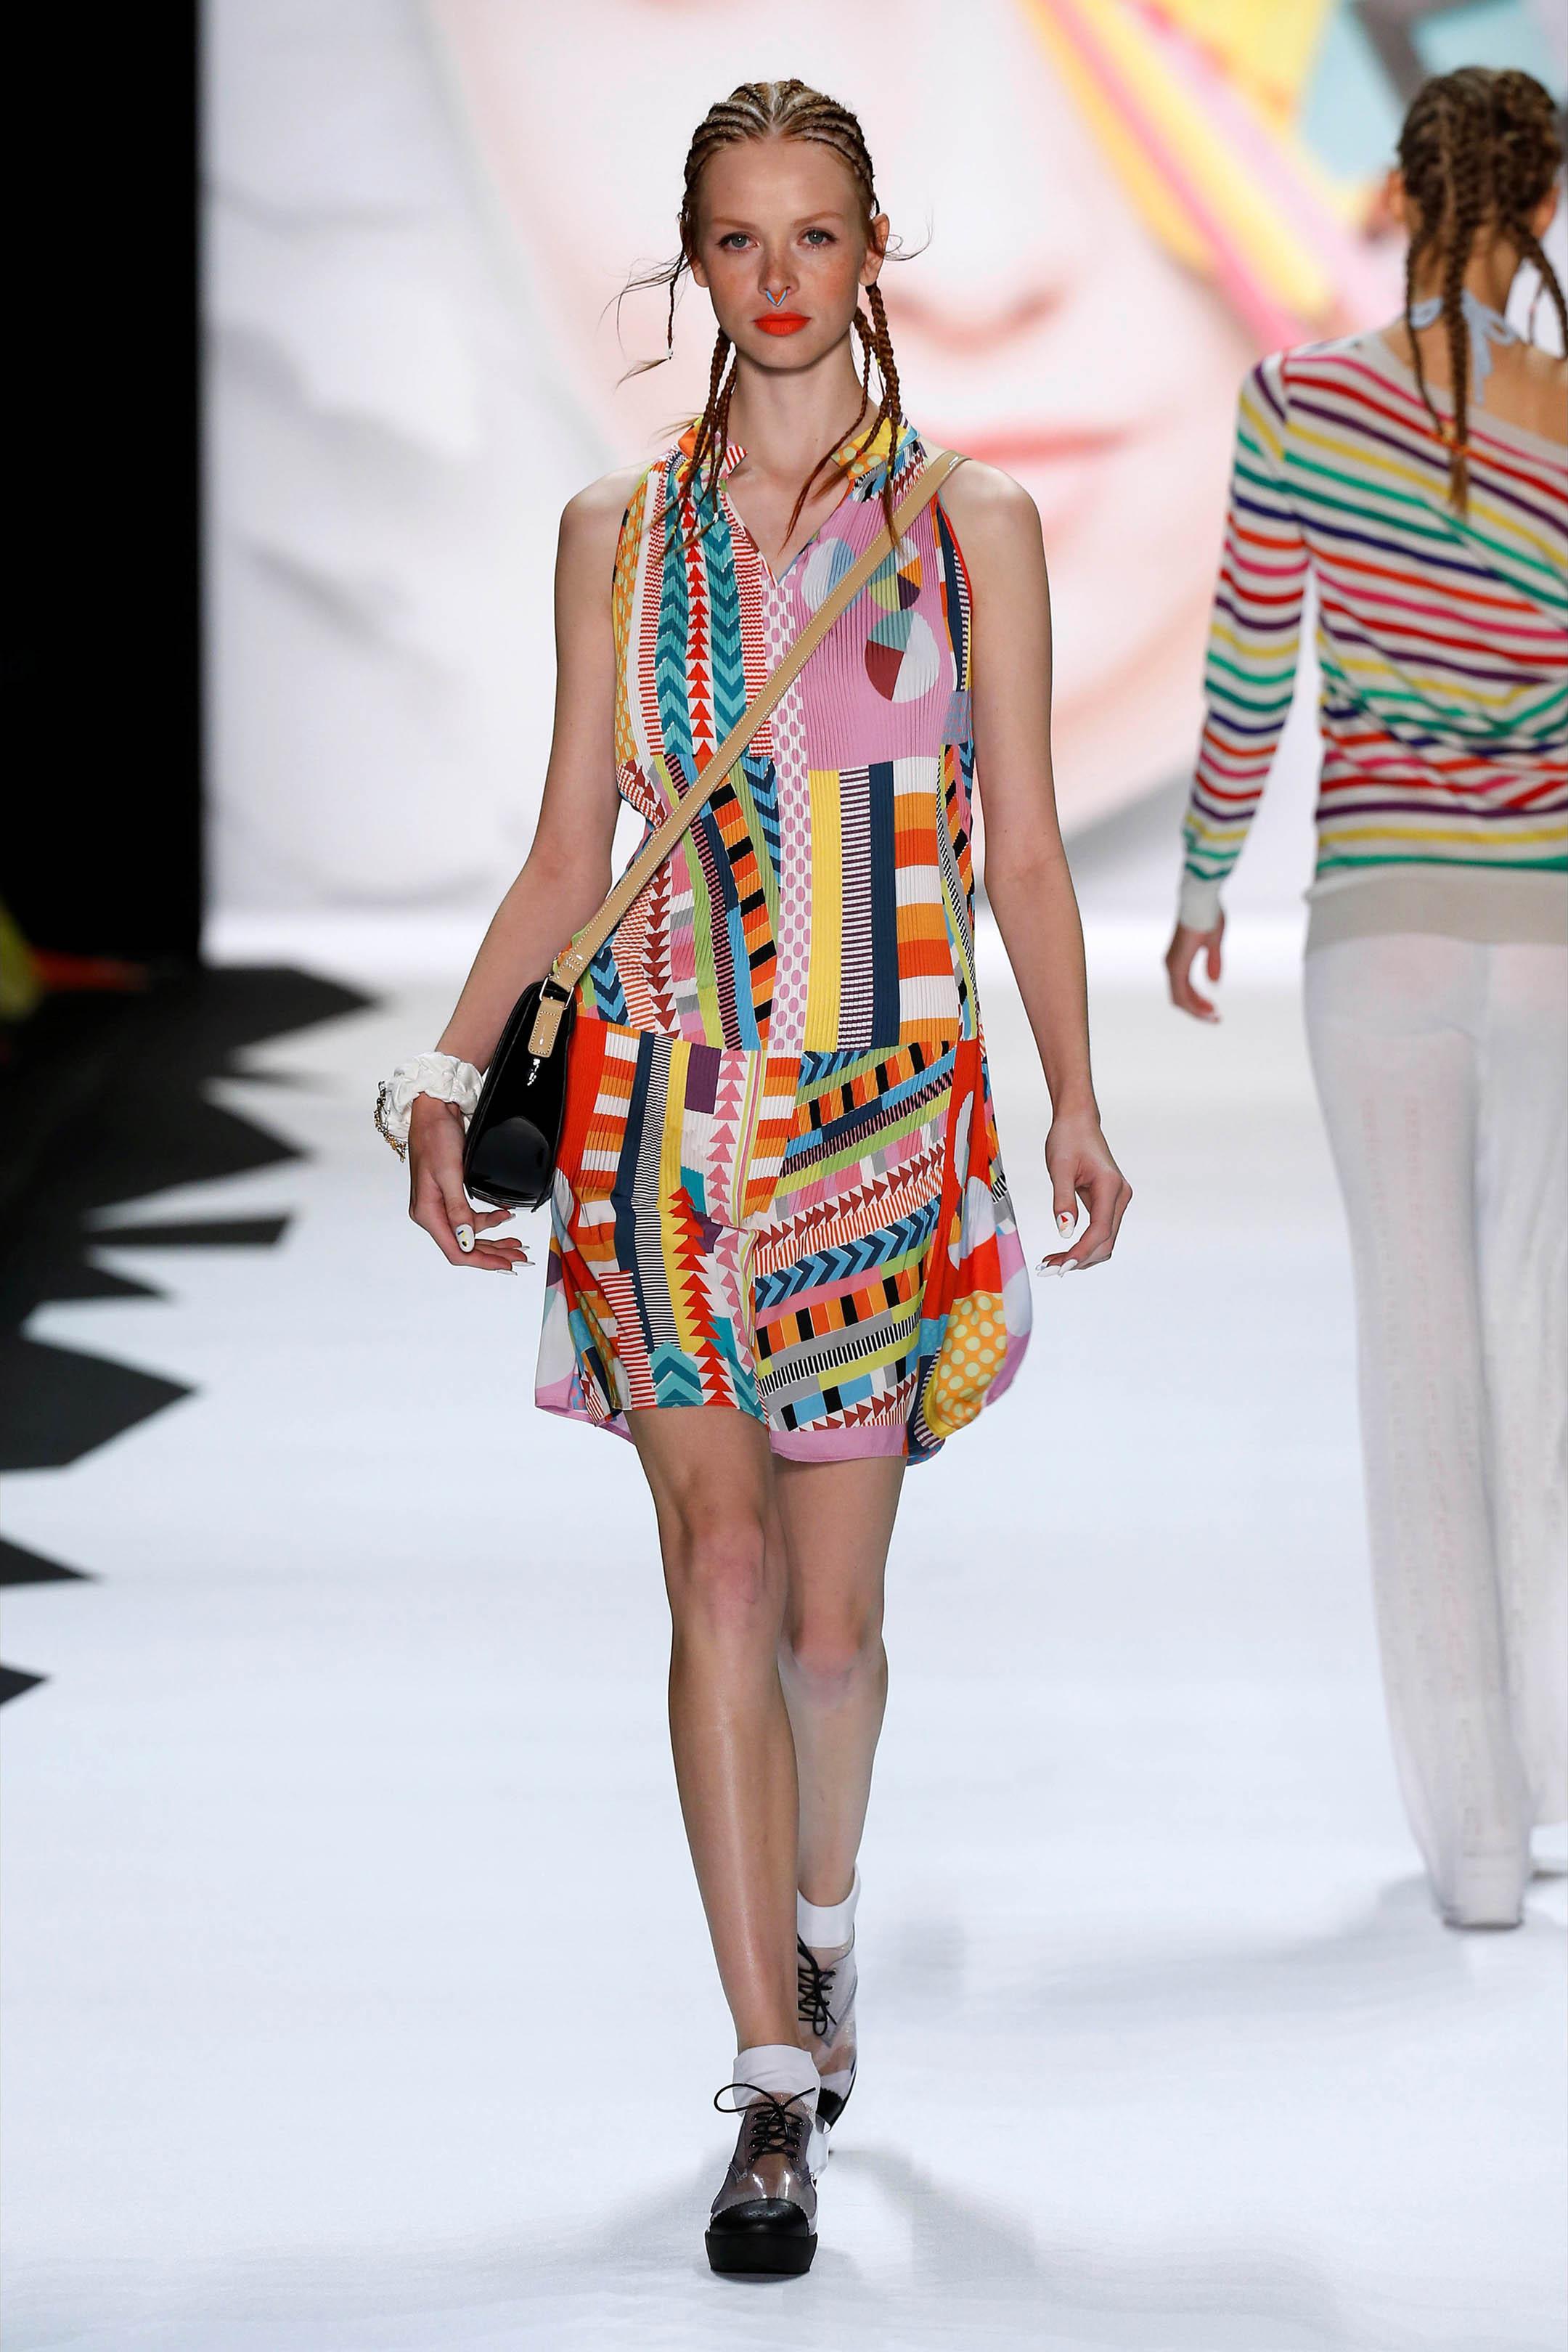 styleshouts-trend-treccine-africane-desigual-sfilata-new-york-fashion-week-moda